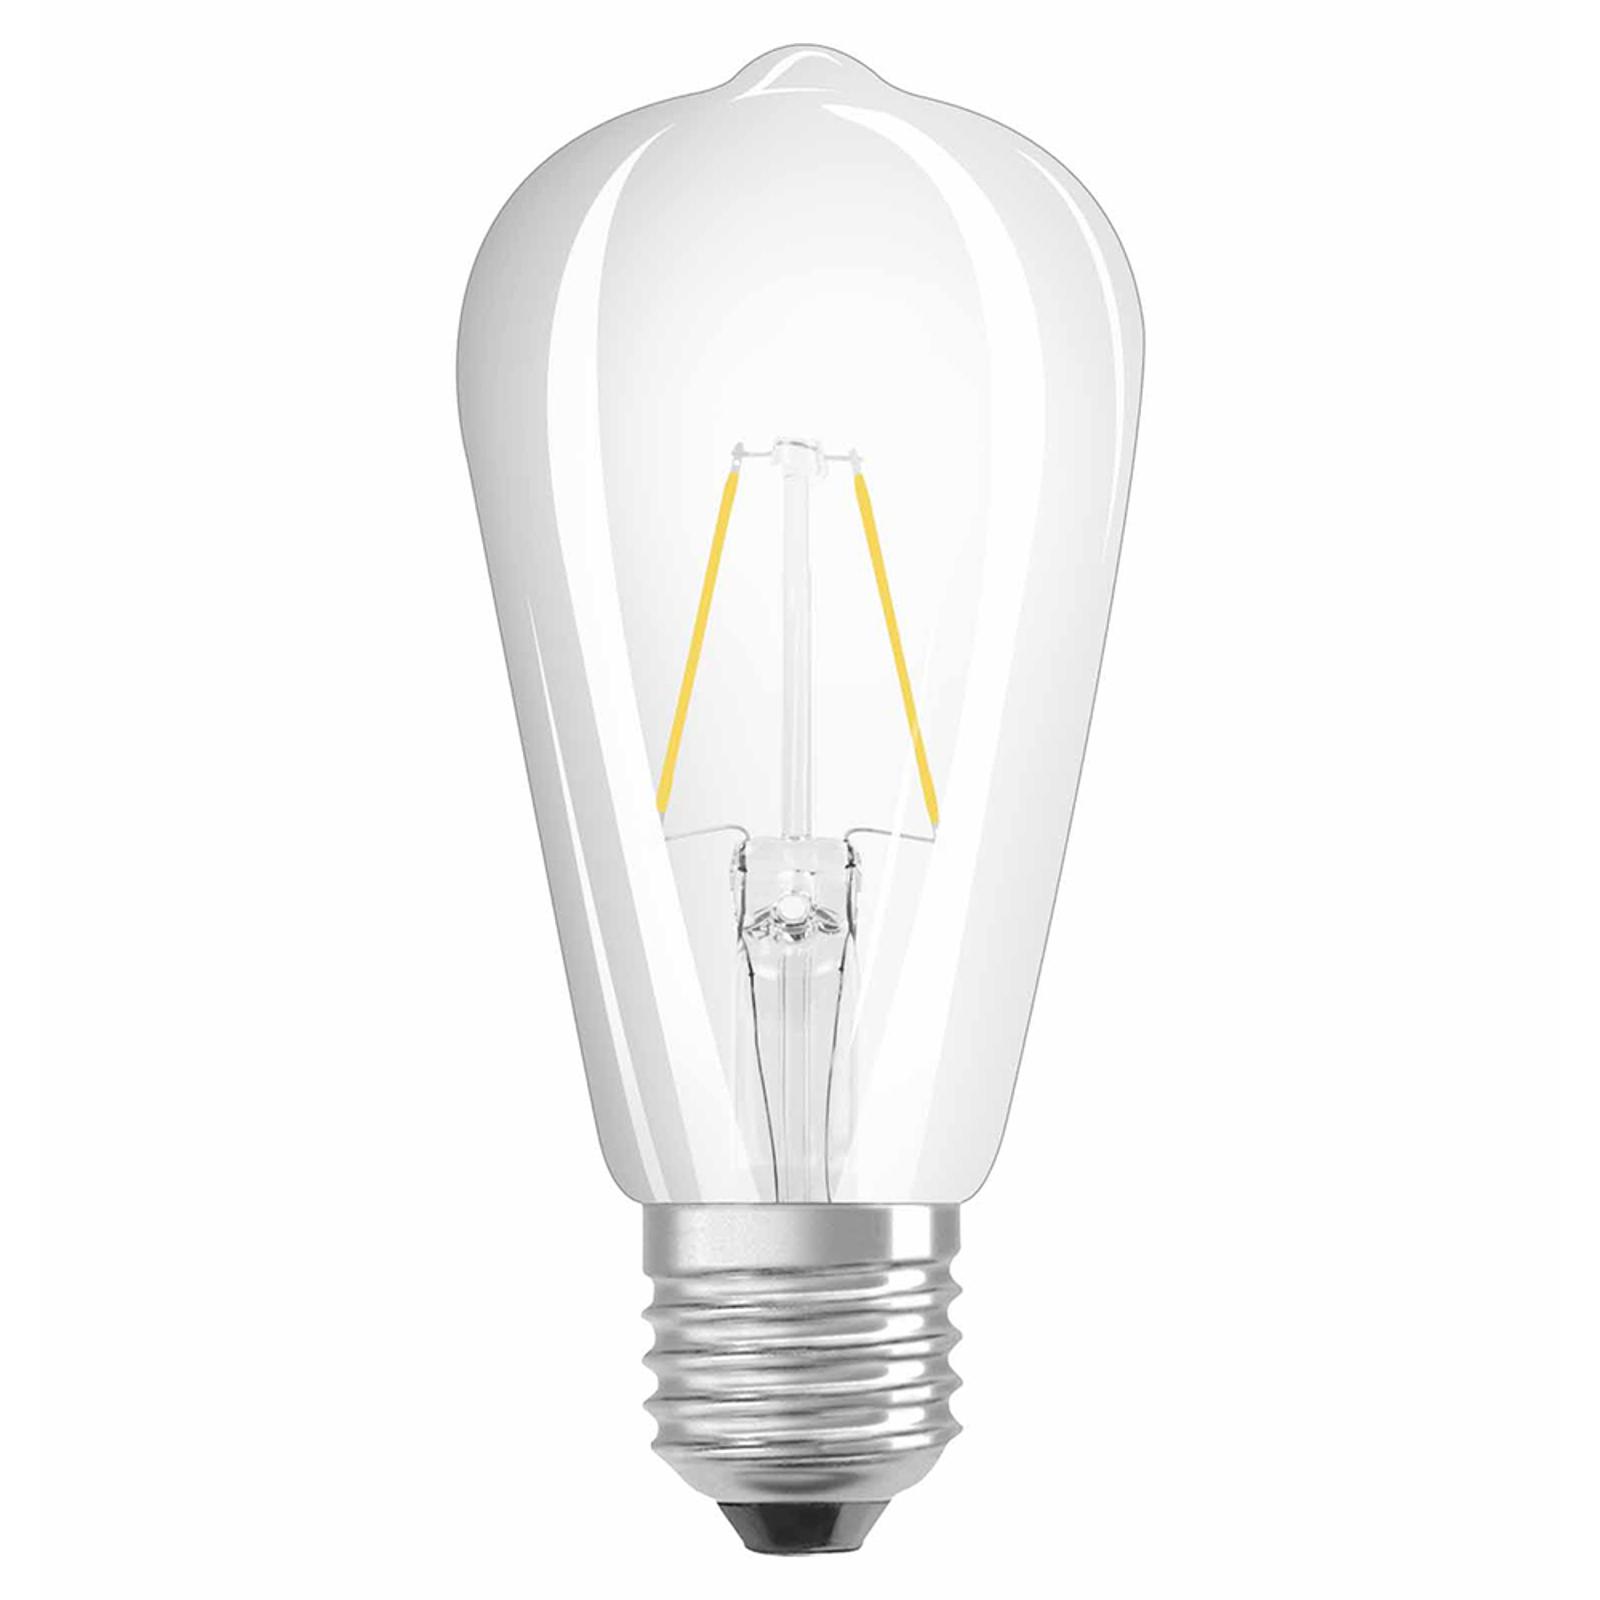 OSRAM-LED-lamppu E27 2,5W Rustica 827 kirkas